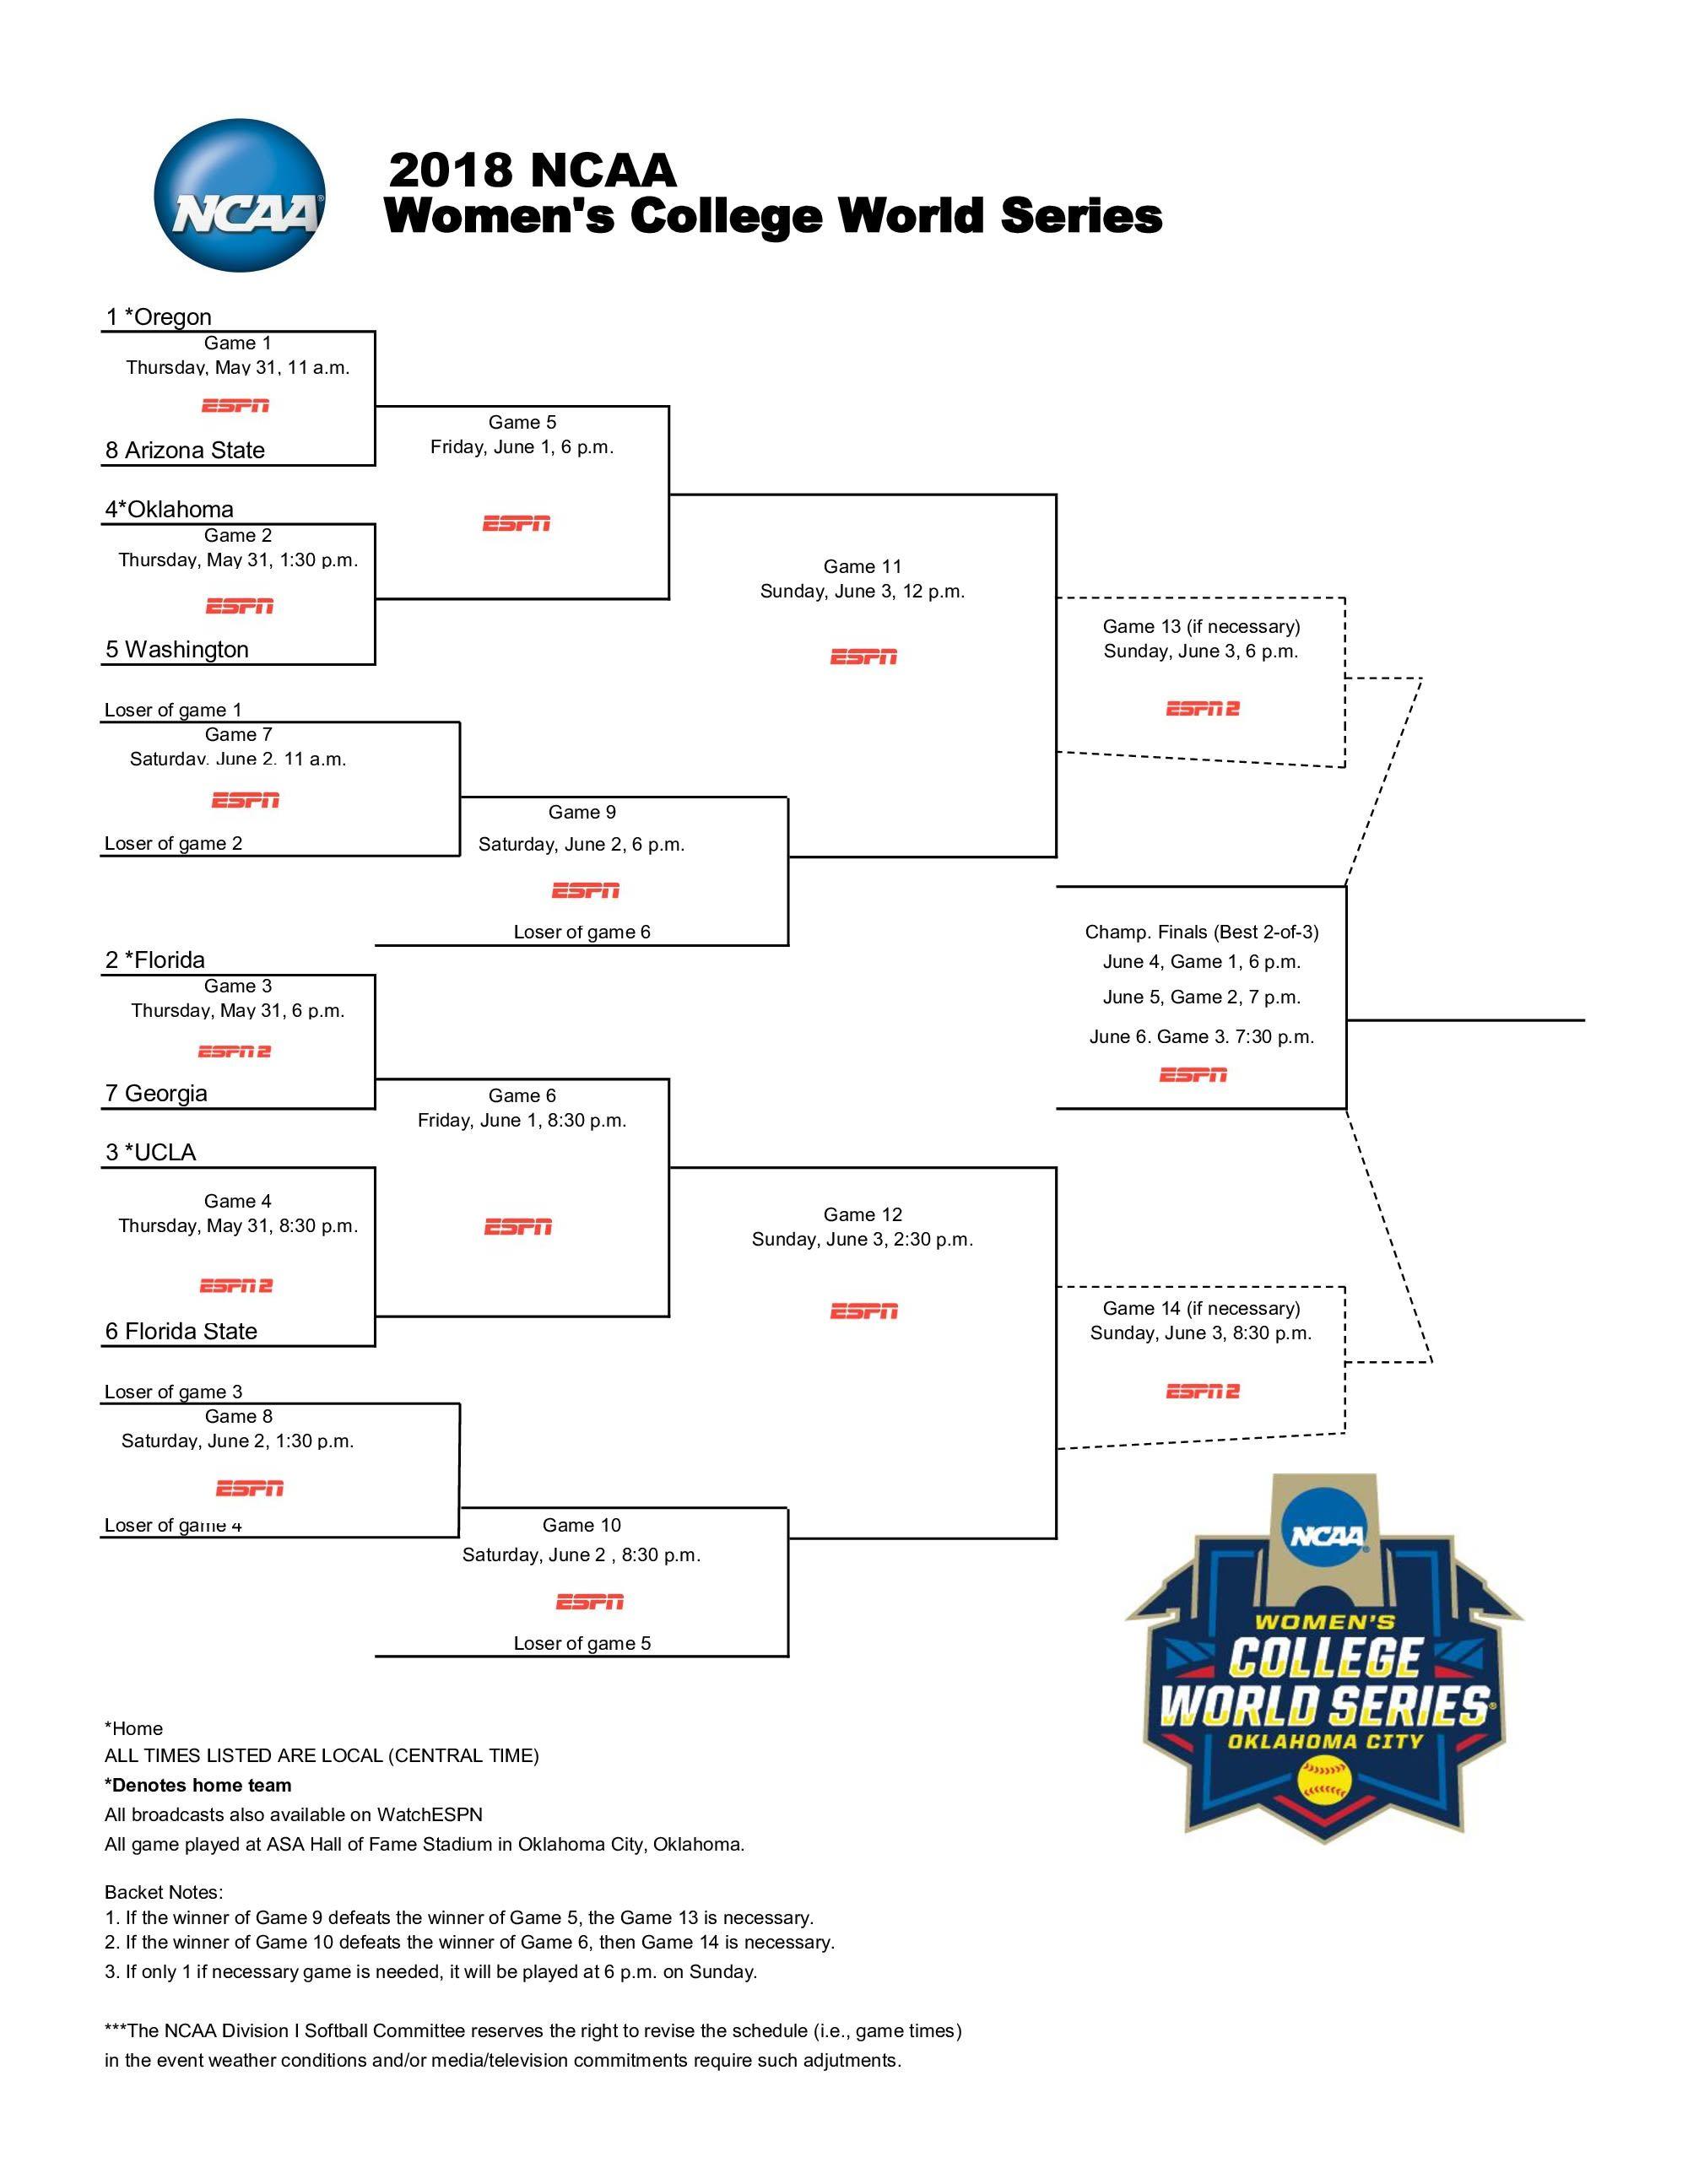 2018 NCAA Softball Tournament Bracket, scores, schedule